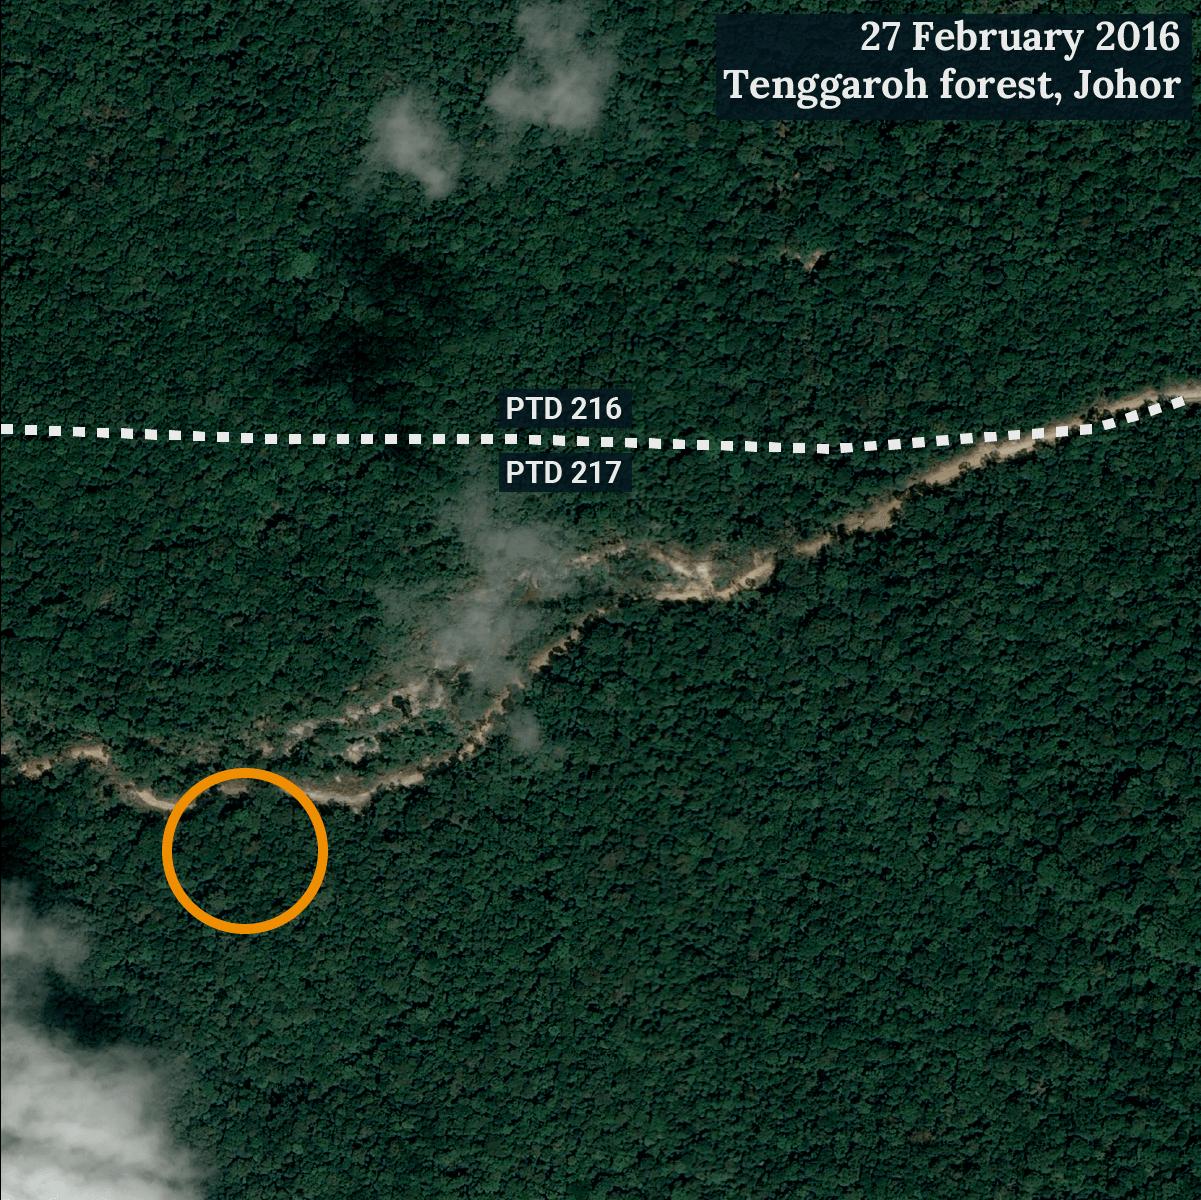 Orange circle marks a site near a reported location of endangered Meranti telopok (Shorea peltata) trees. (Satellite image ©CNES 2016 Distribution Airbus DS / Earthrise)